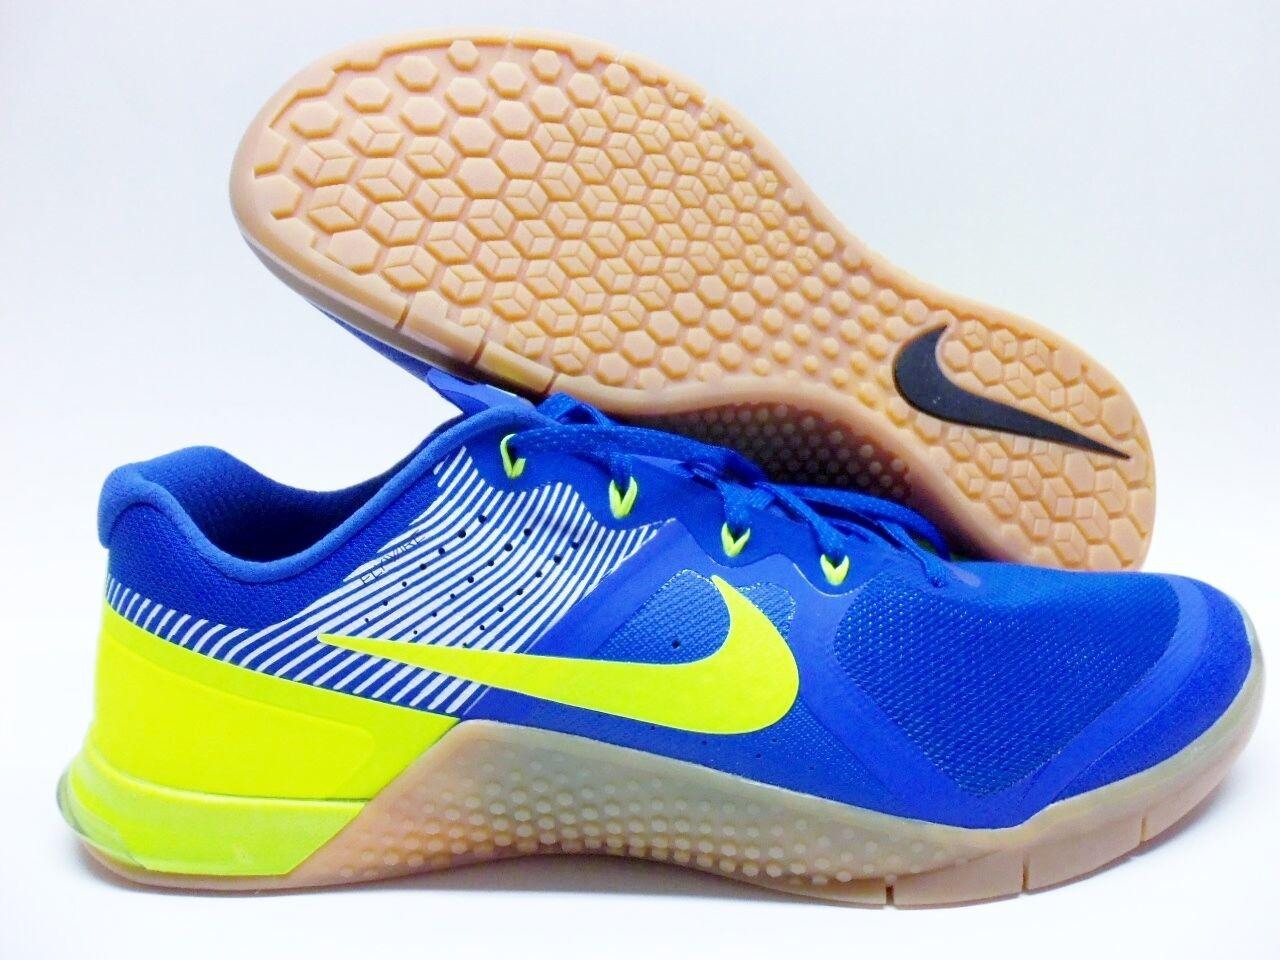 Nike metcon 2 royal id varsity royal 2 / volt-white-gum dimensioni uomini 14 [846027-991] 016305